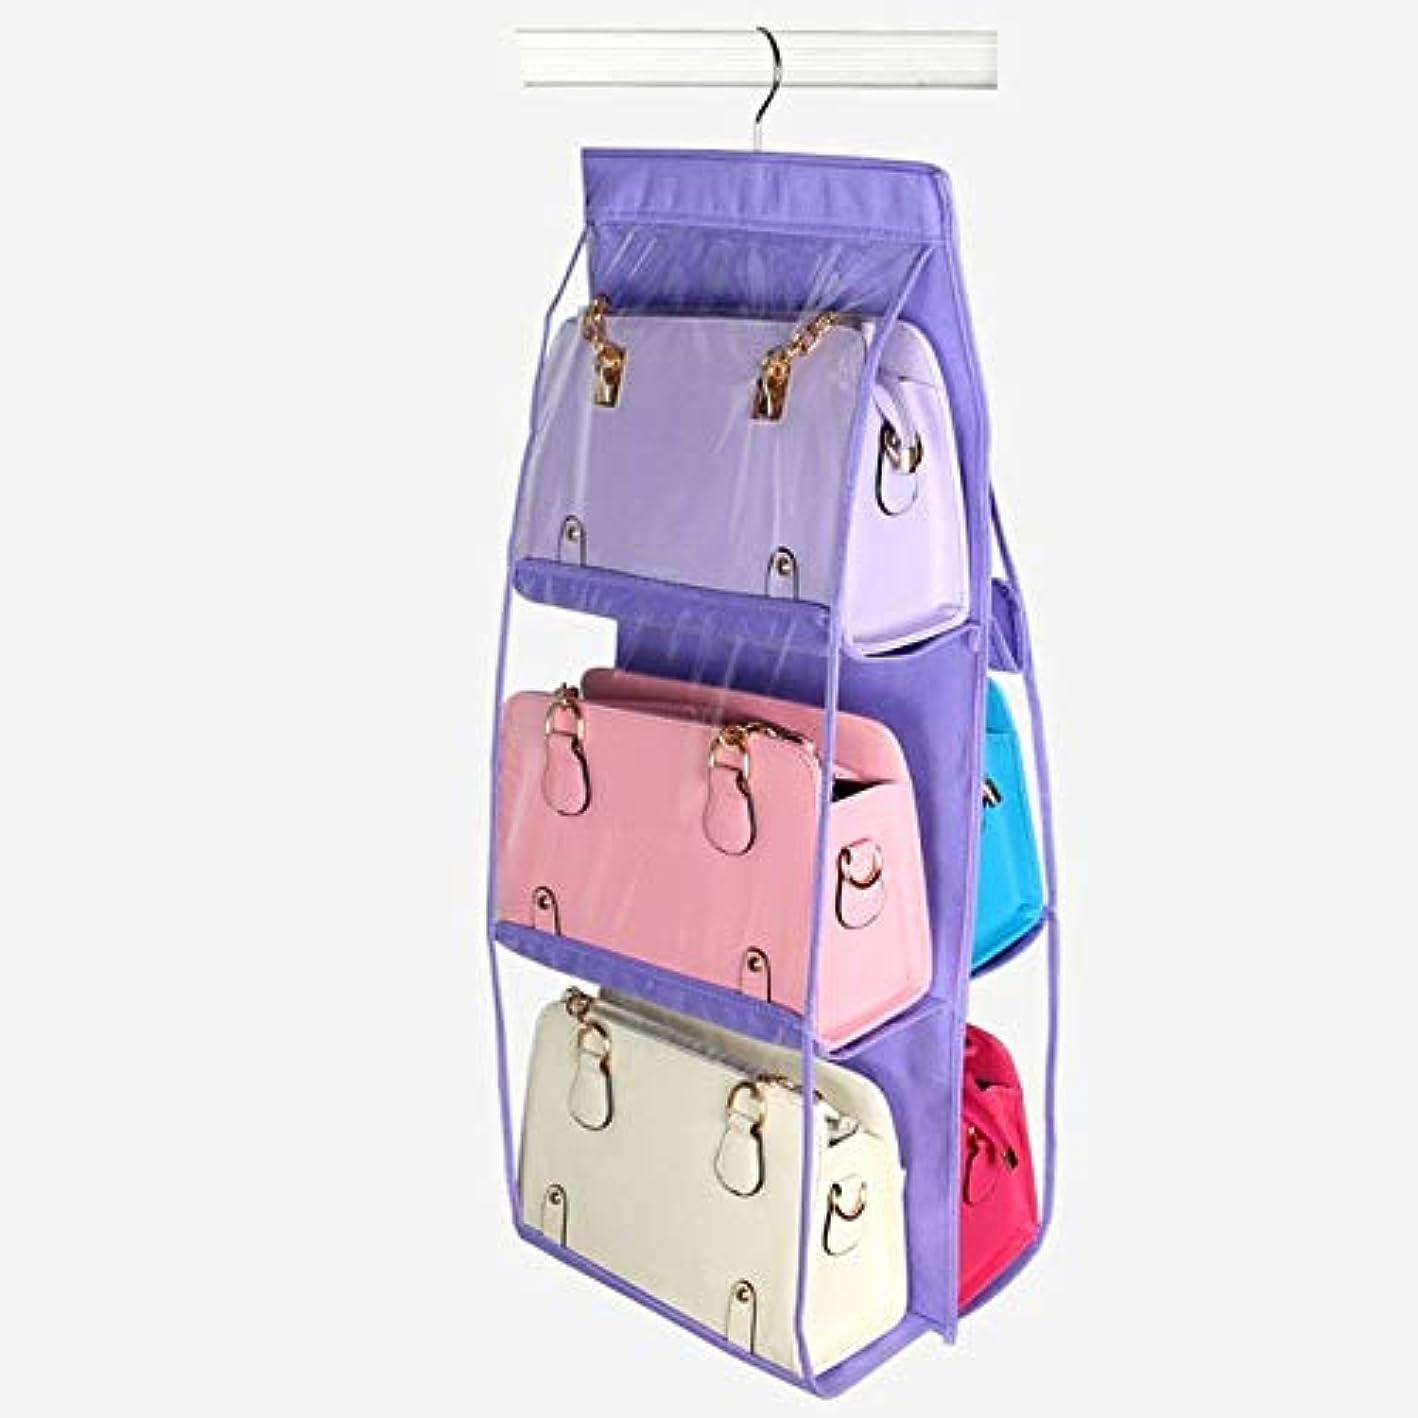 6 Pocket Folding Hanging Handbag Storage Sundry Storage Bag Shoe Organizer for Organizer Close Closet Supplies Hanging Home